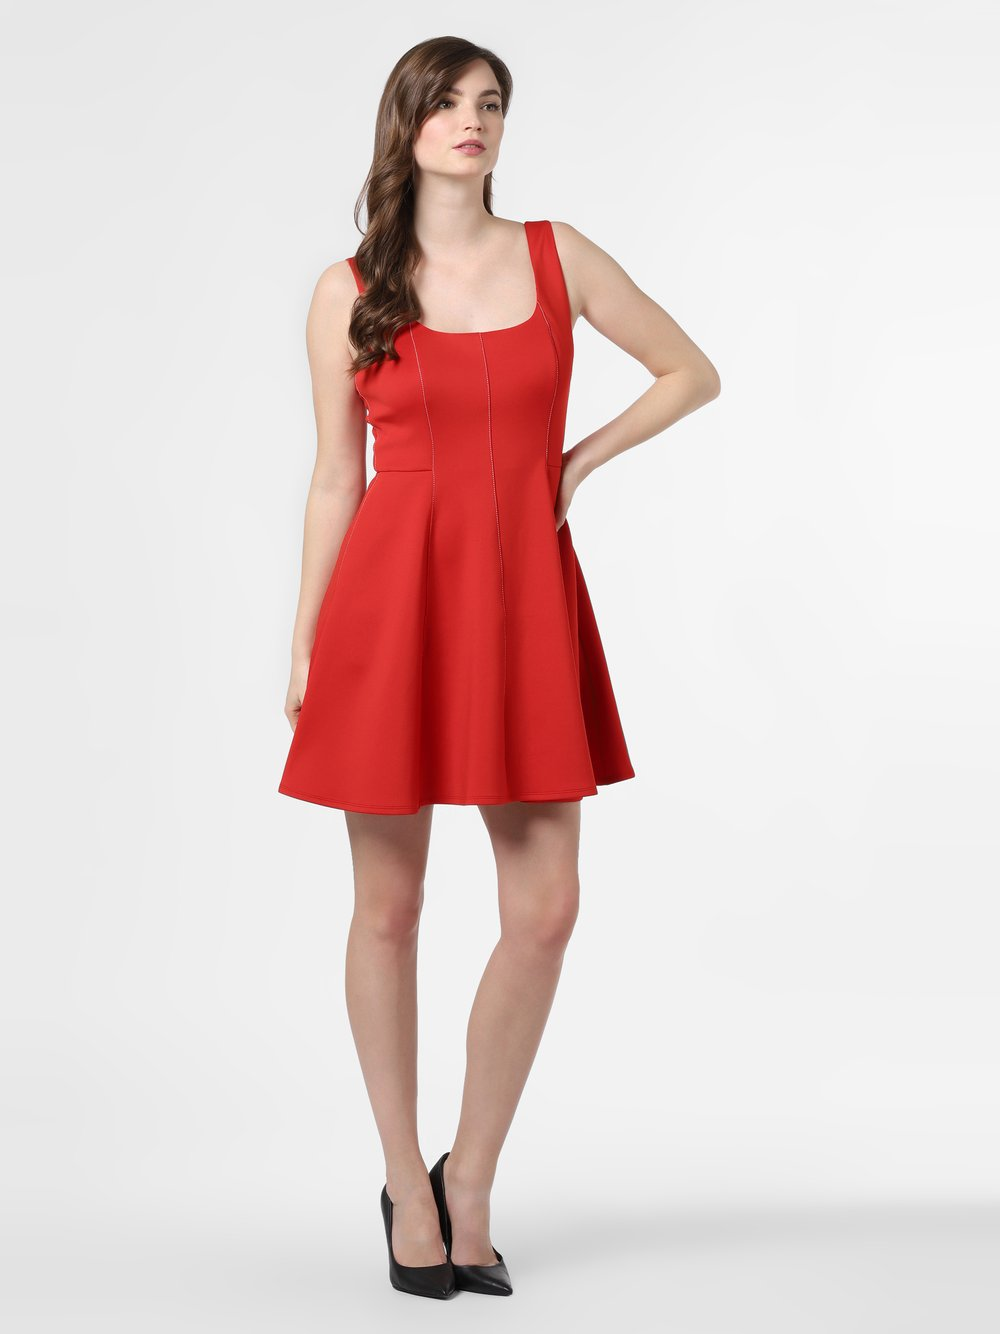 Ted Baker – Sukienka damska – Lohanna, czerwony Van Graaf 487518-0001-00420